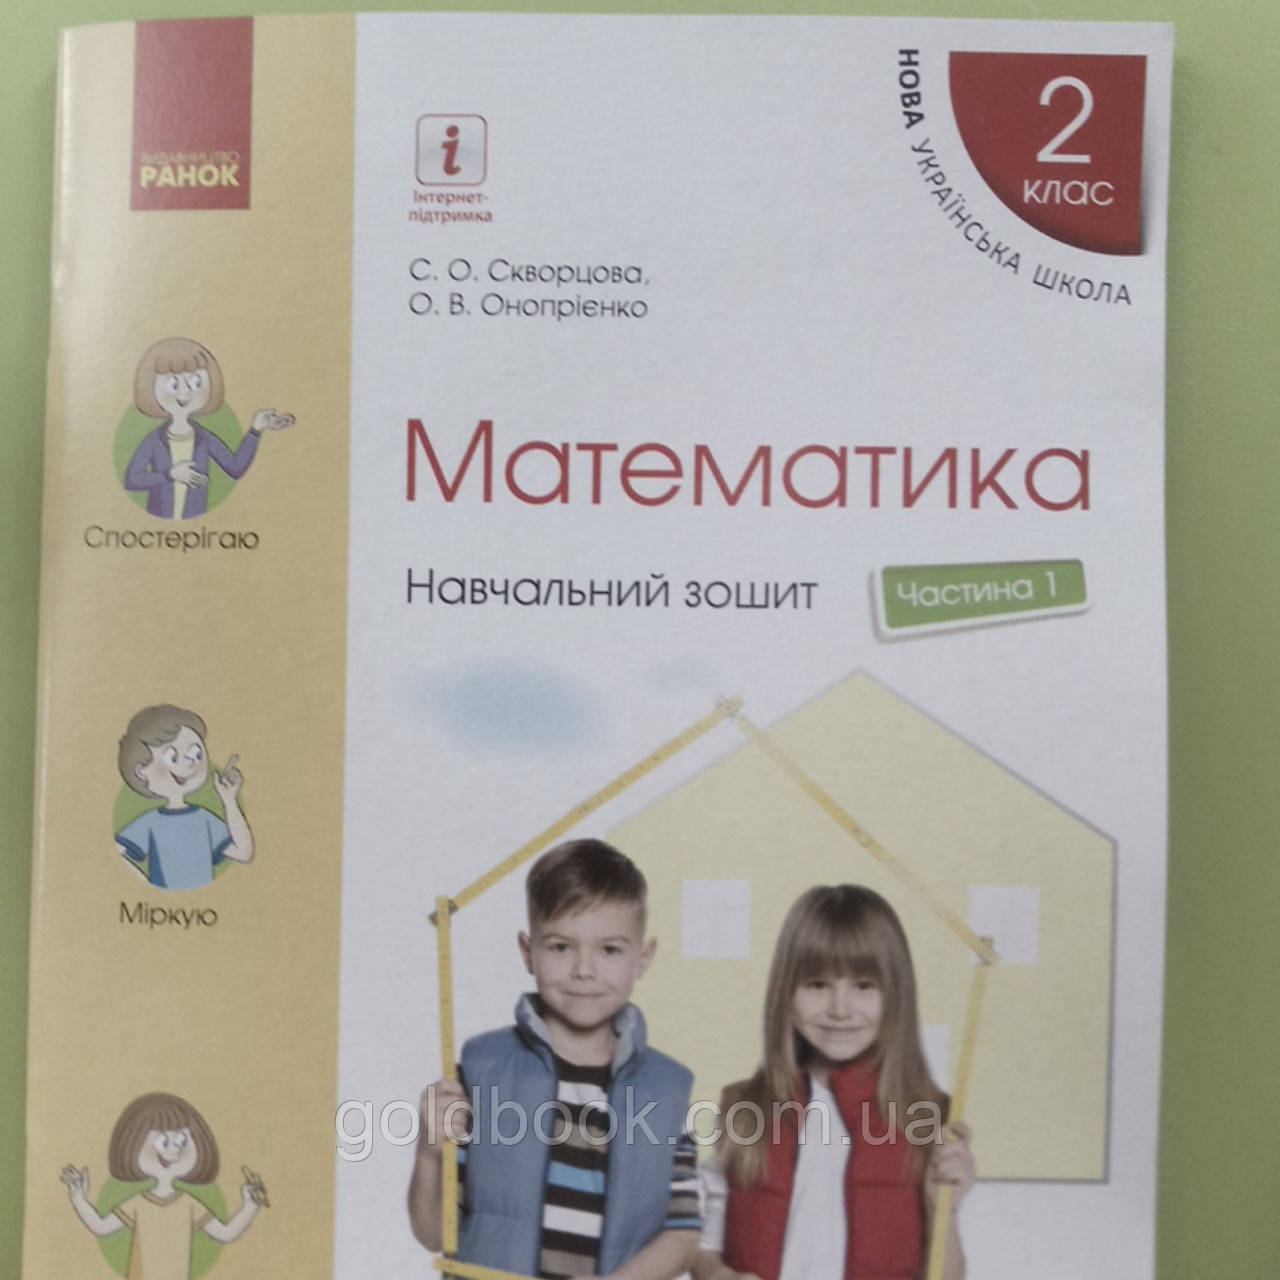 Математика 2 клас навчальний зошит (1 частина)